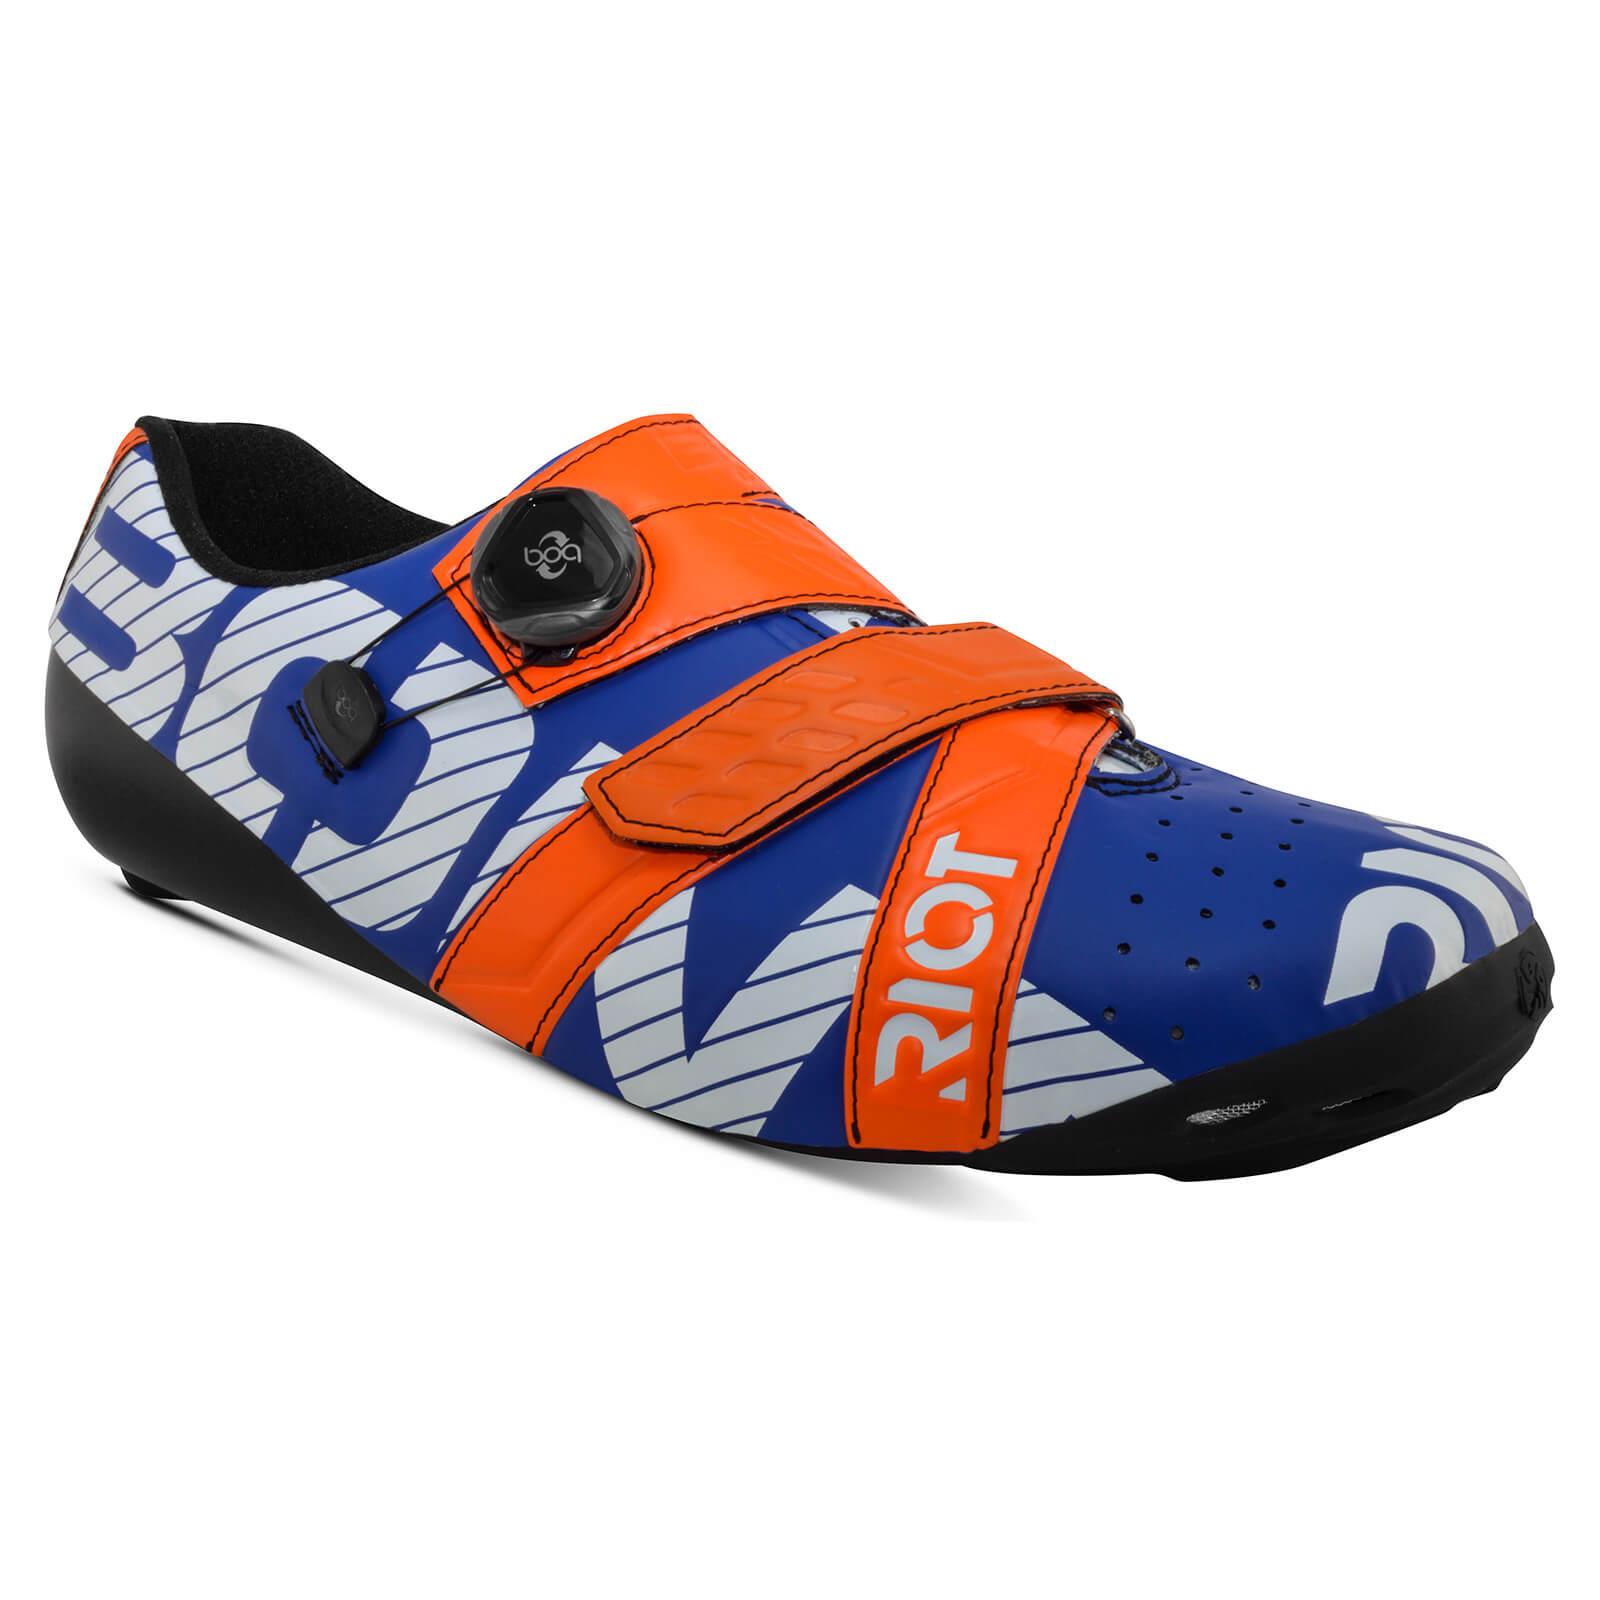 Bont Riot+ Road Shoes - EU 44 - Blue/Red